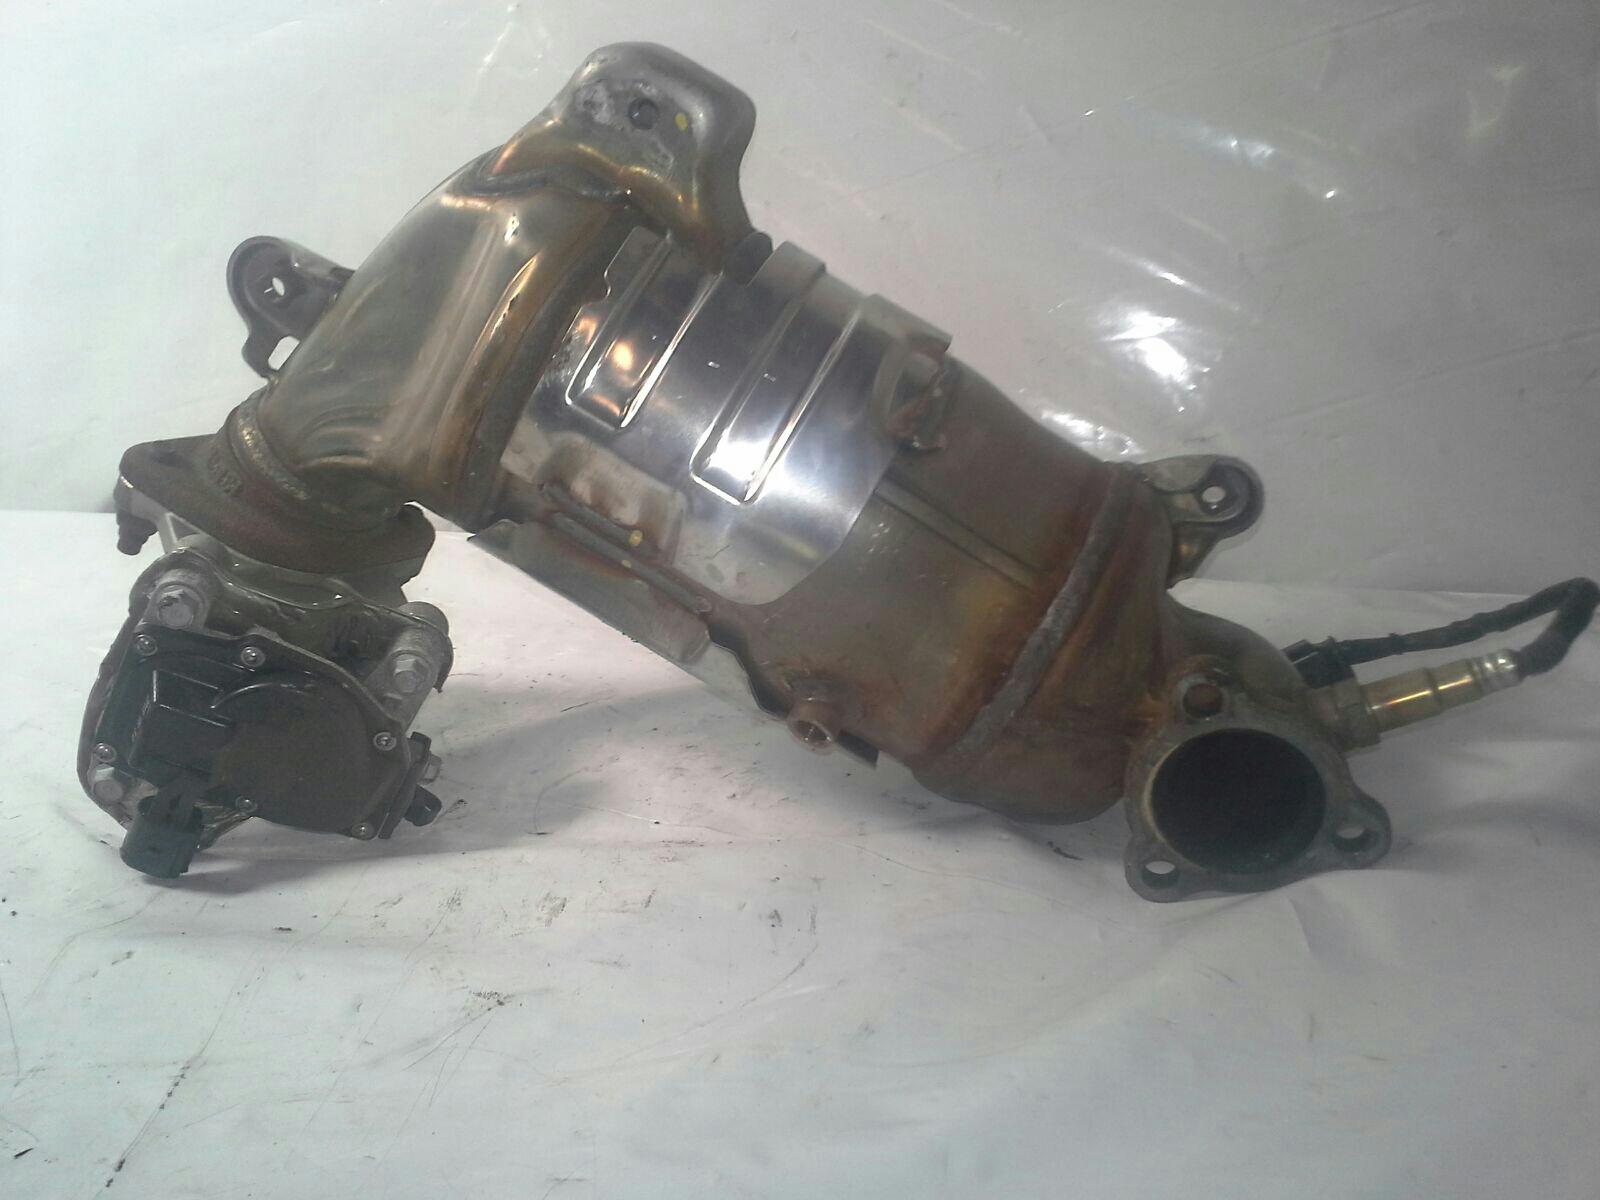 Kia Sorento 2012 To 2014 Exhaust Particulate Filter Diesel Fuel Dpf Kx 2 Sat Nav 4wd 22 5151136